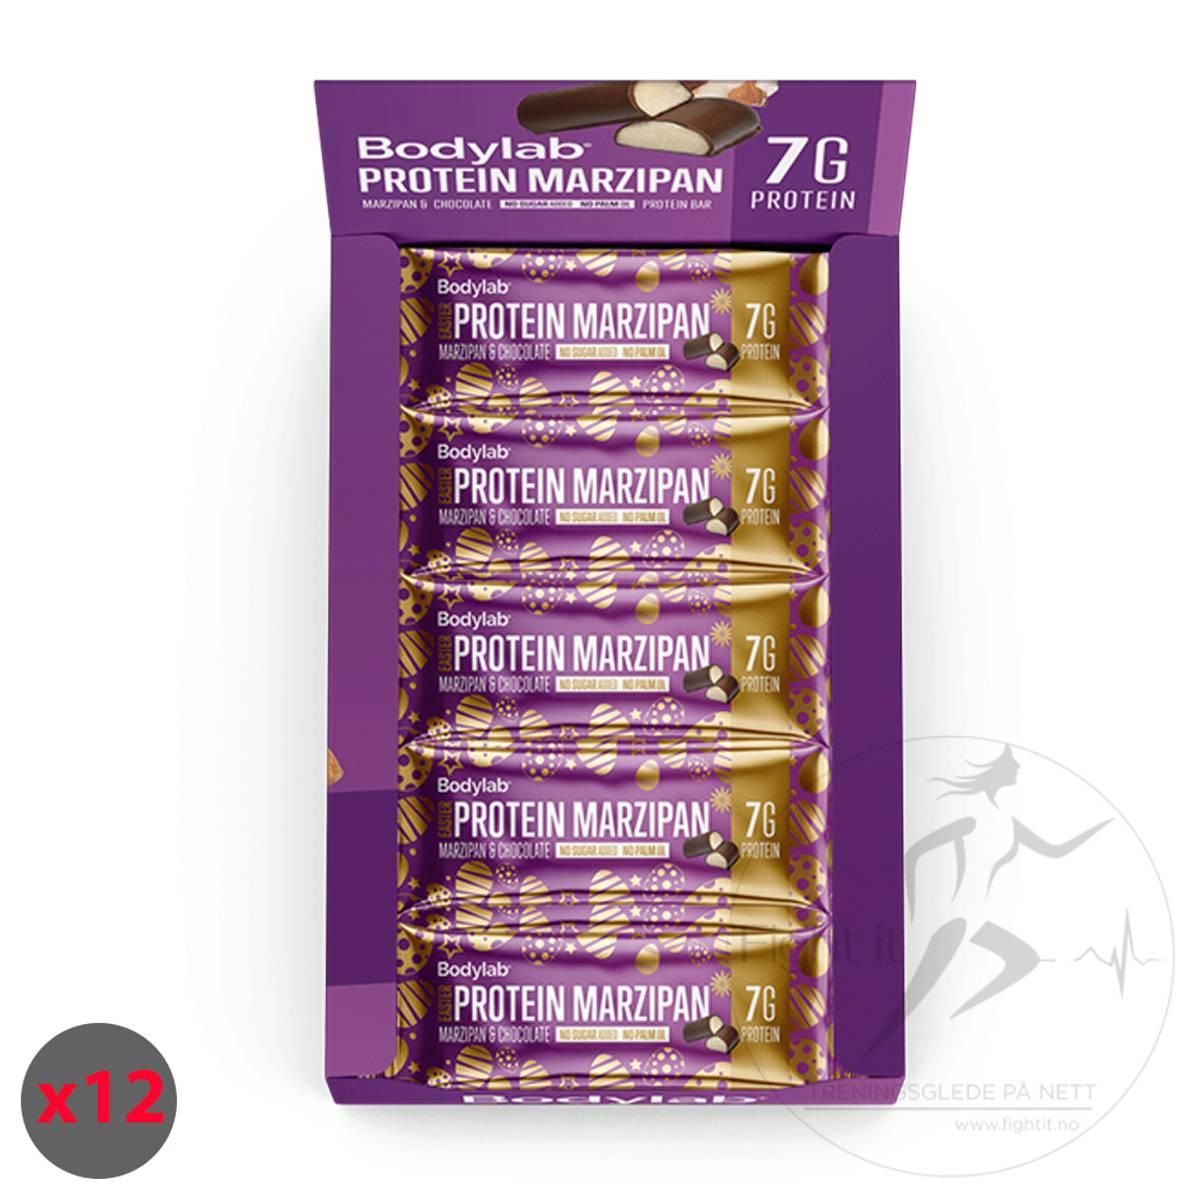 Bodylab - Protein Marzipan 50g